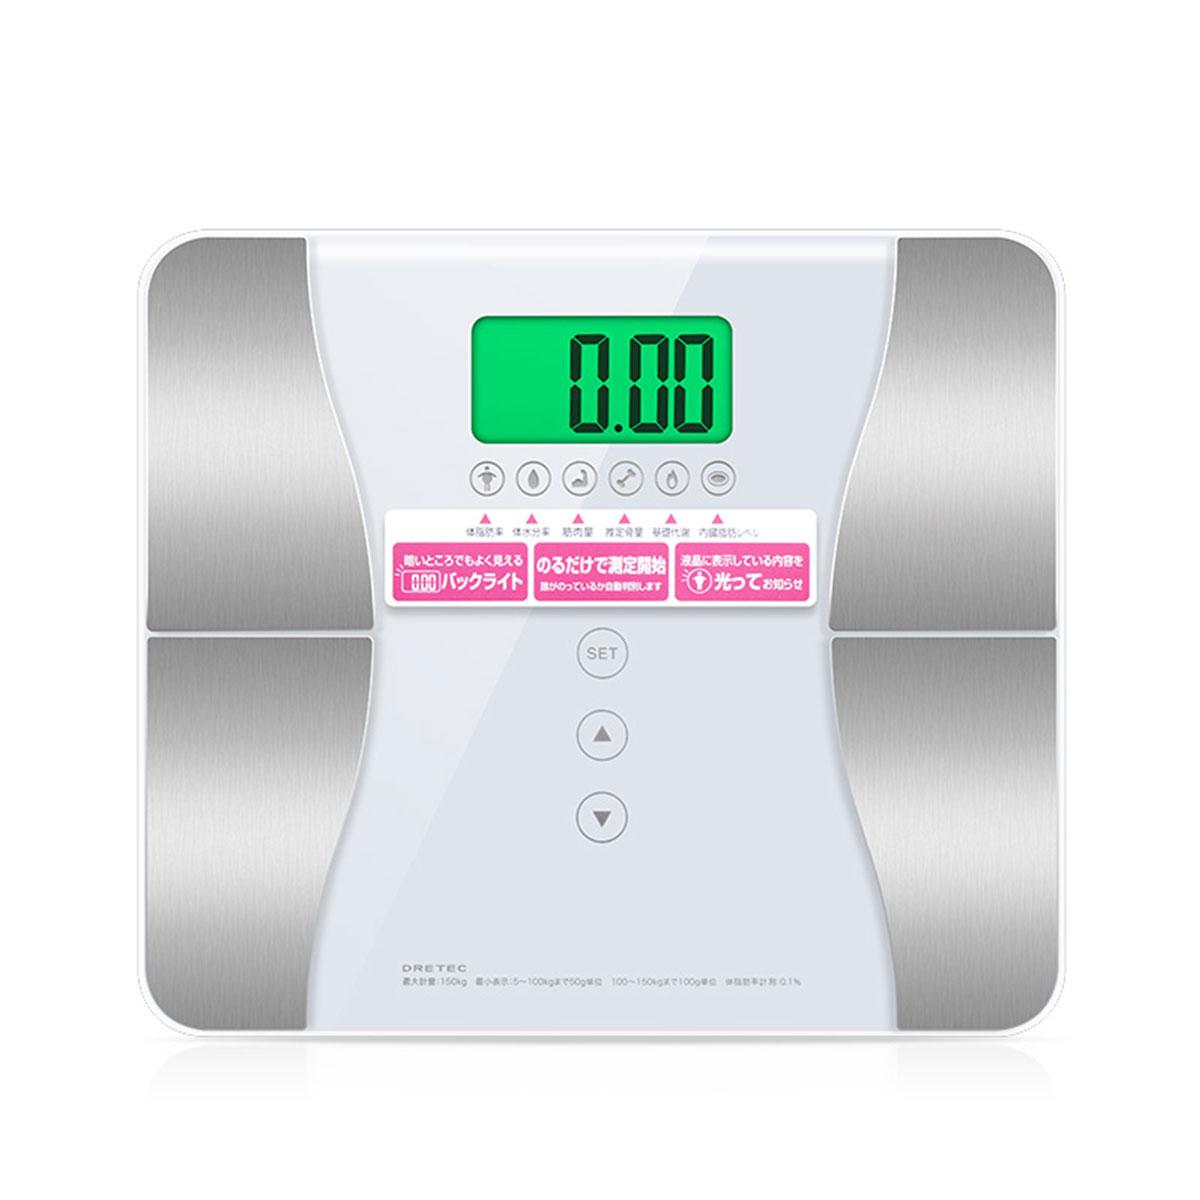 dretec 多利科日本进口体脂秤脂肪秤家用体重测量仪成人健康秤减肥夜视